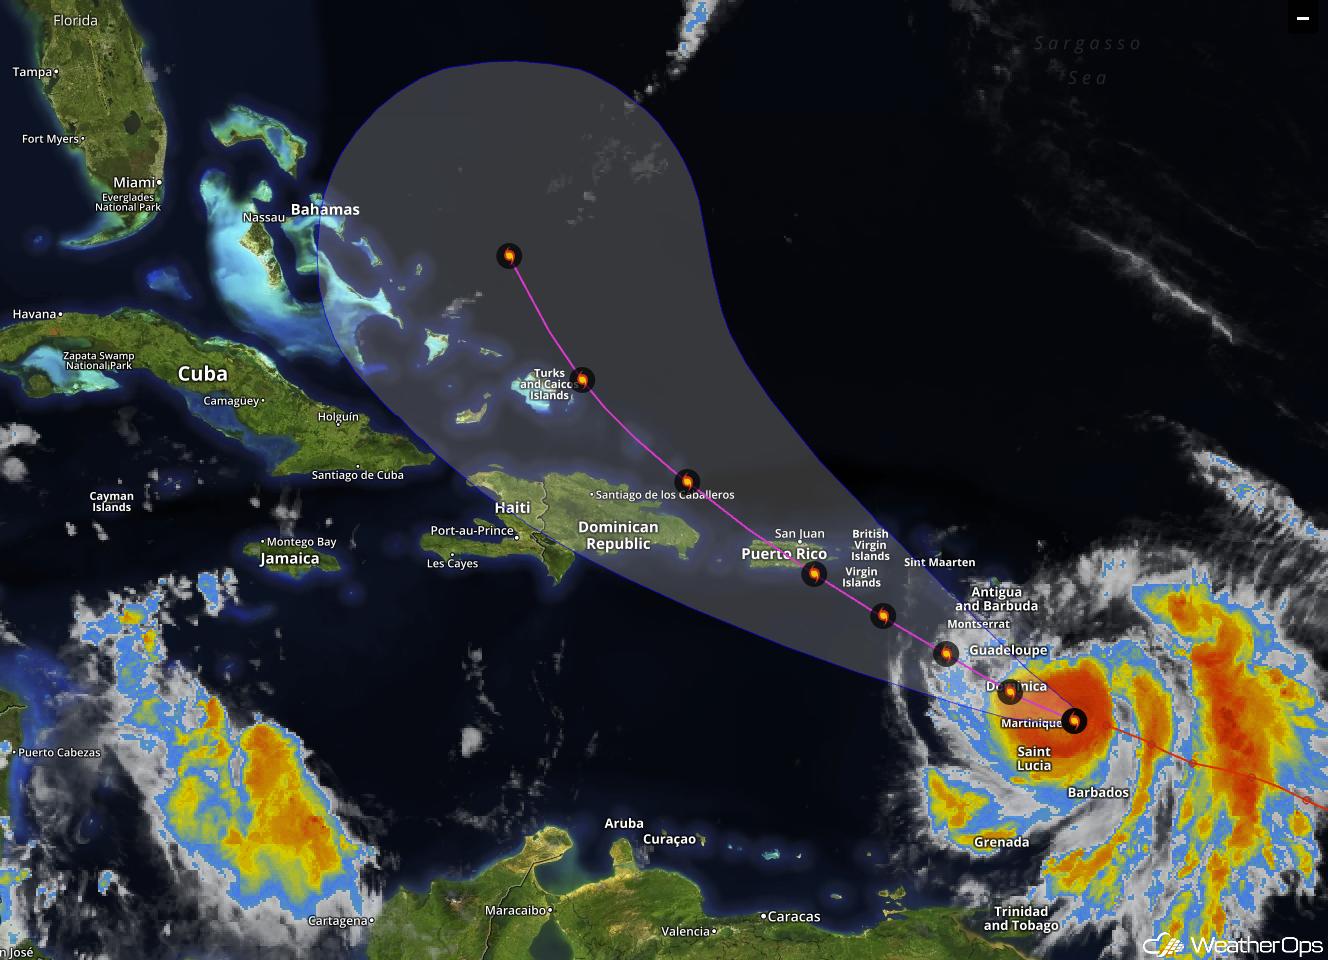 Will Hurricane Maria Follow Irma's Path?